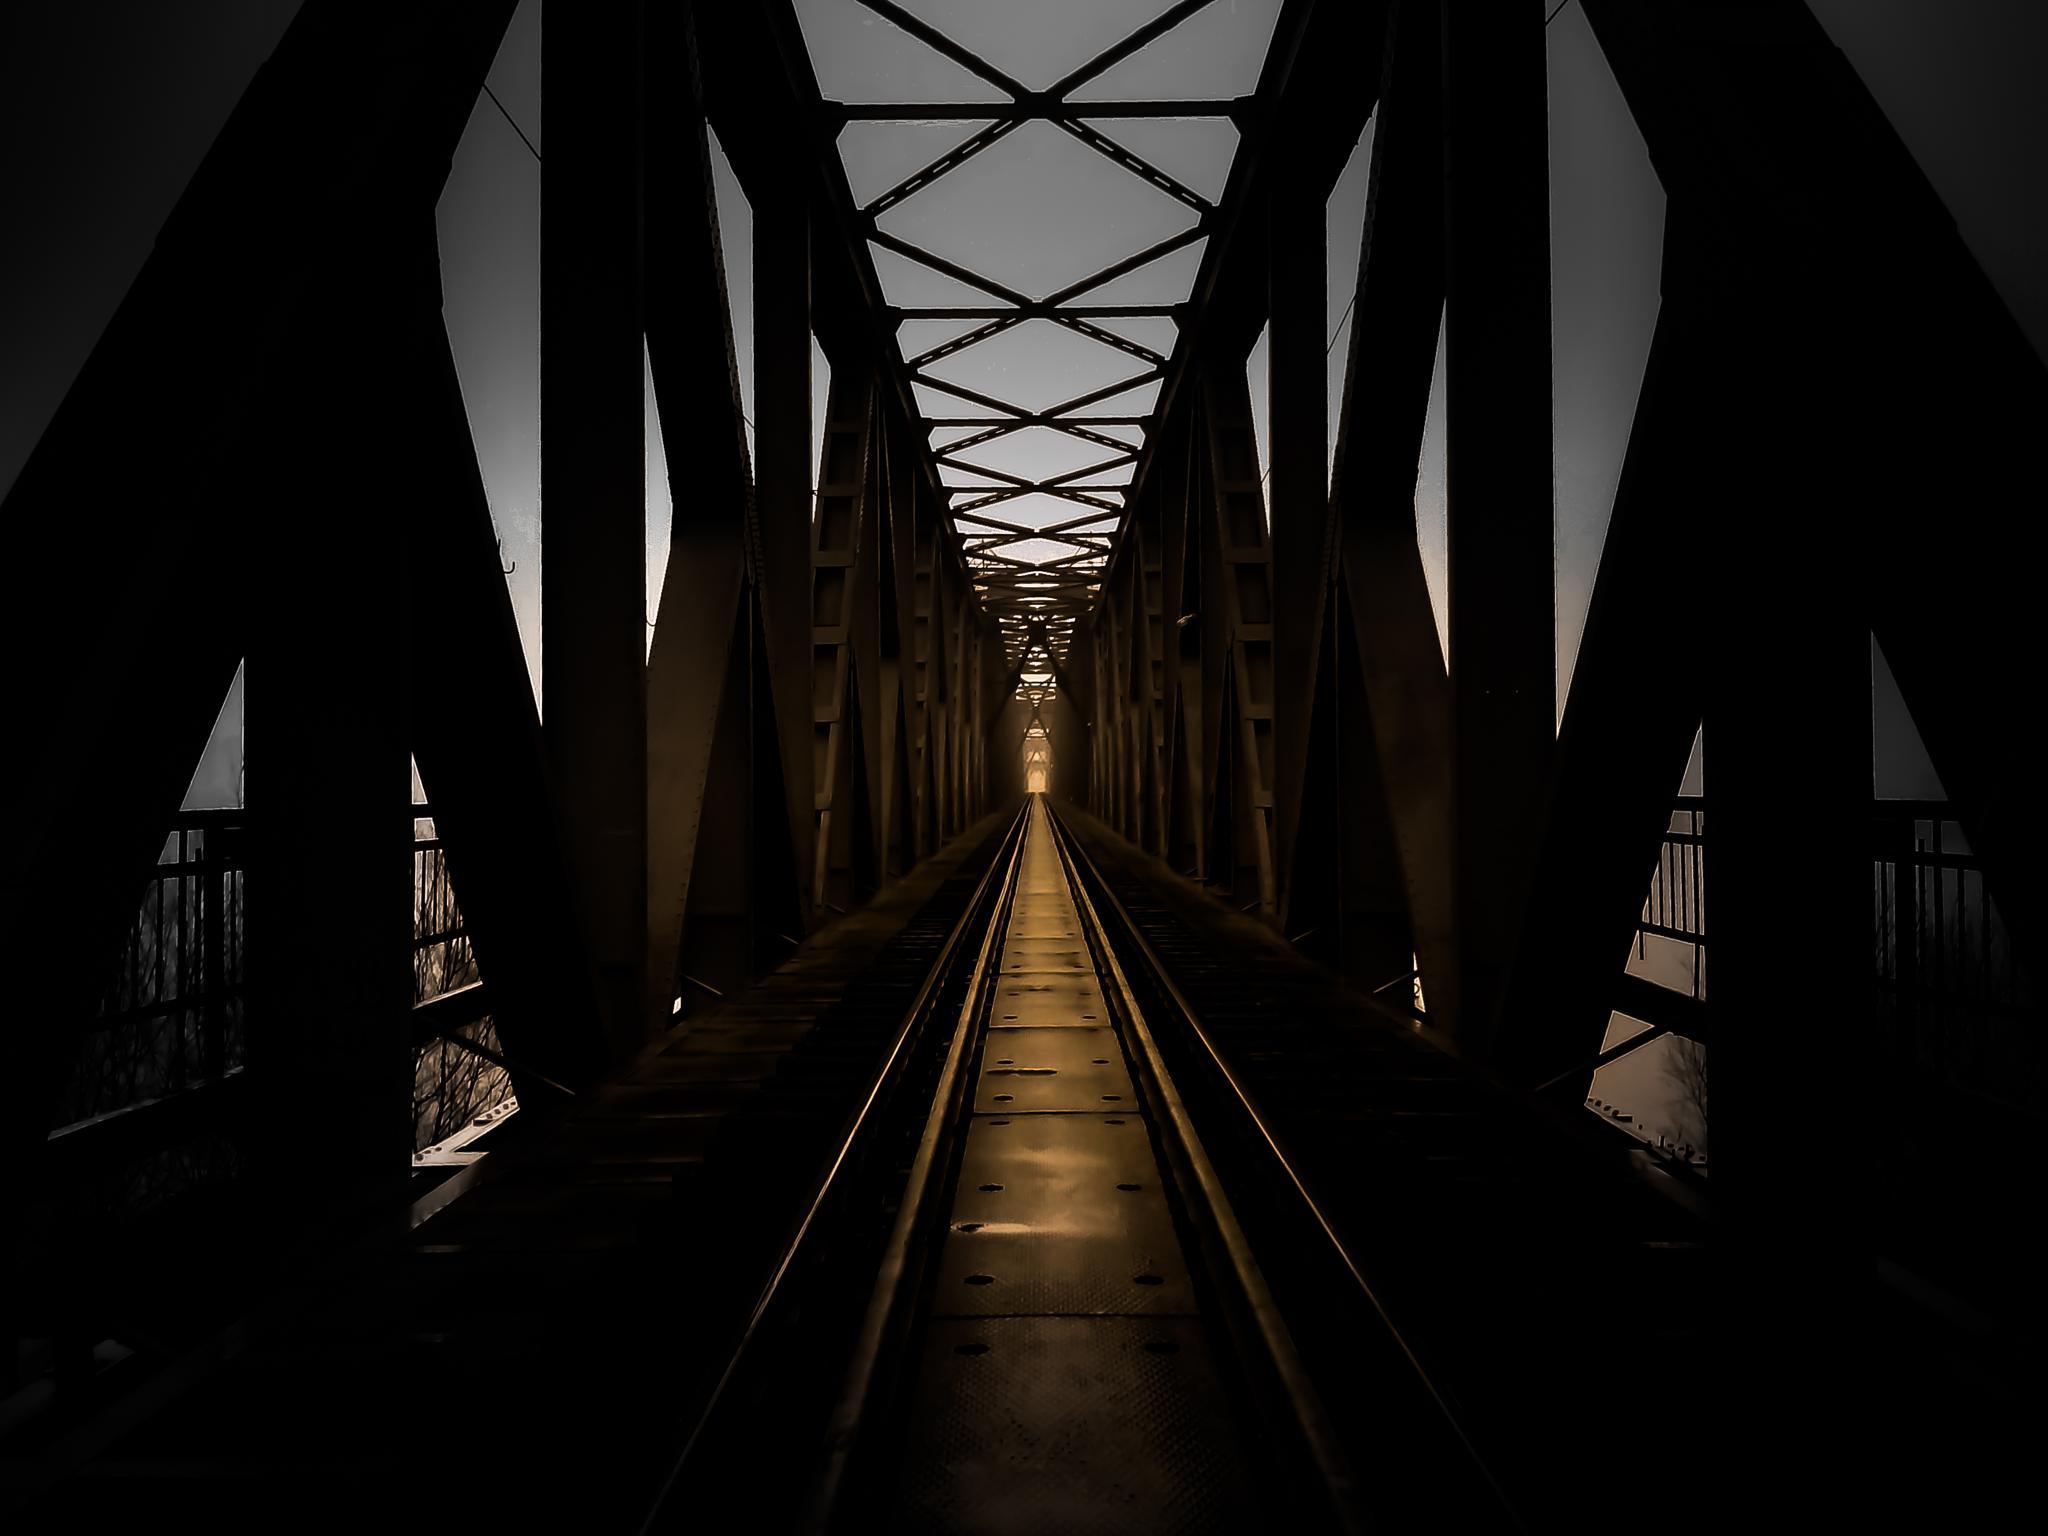 """Old bridge"" by Ninchy"